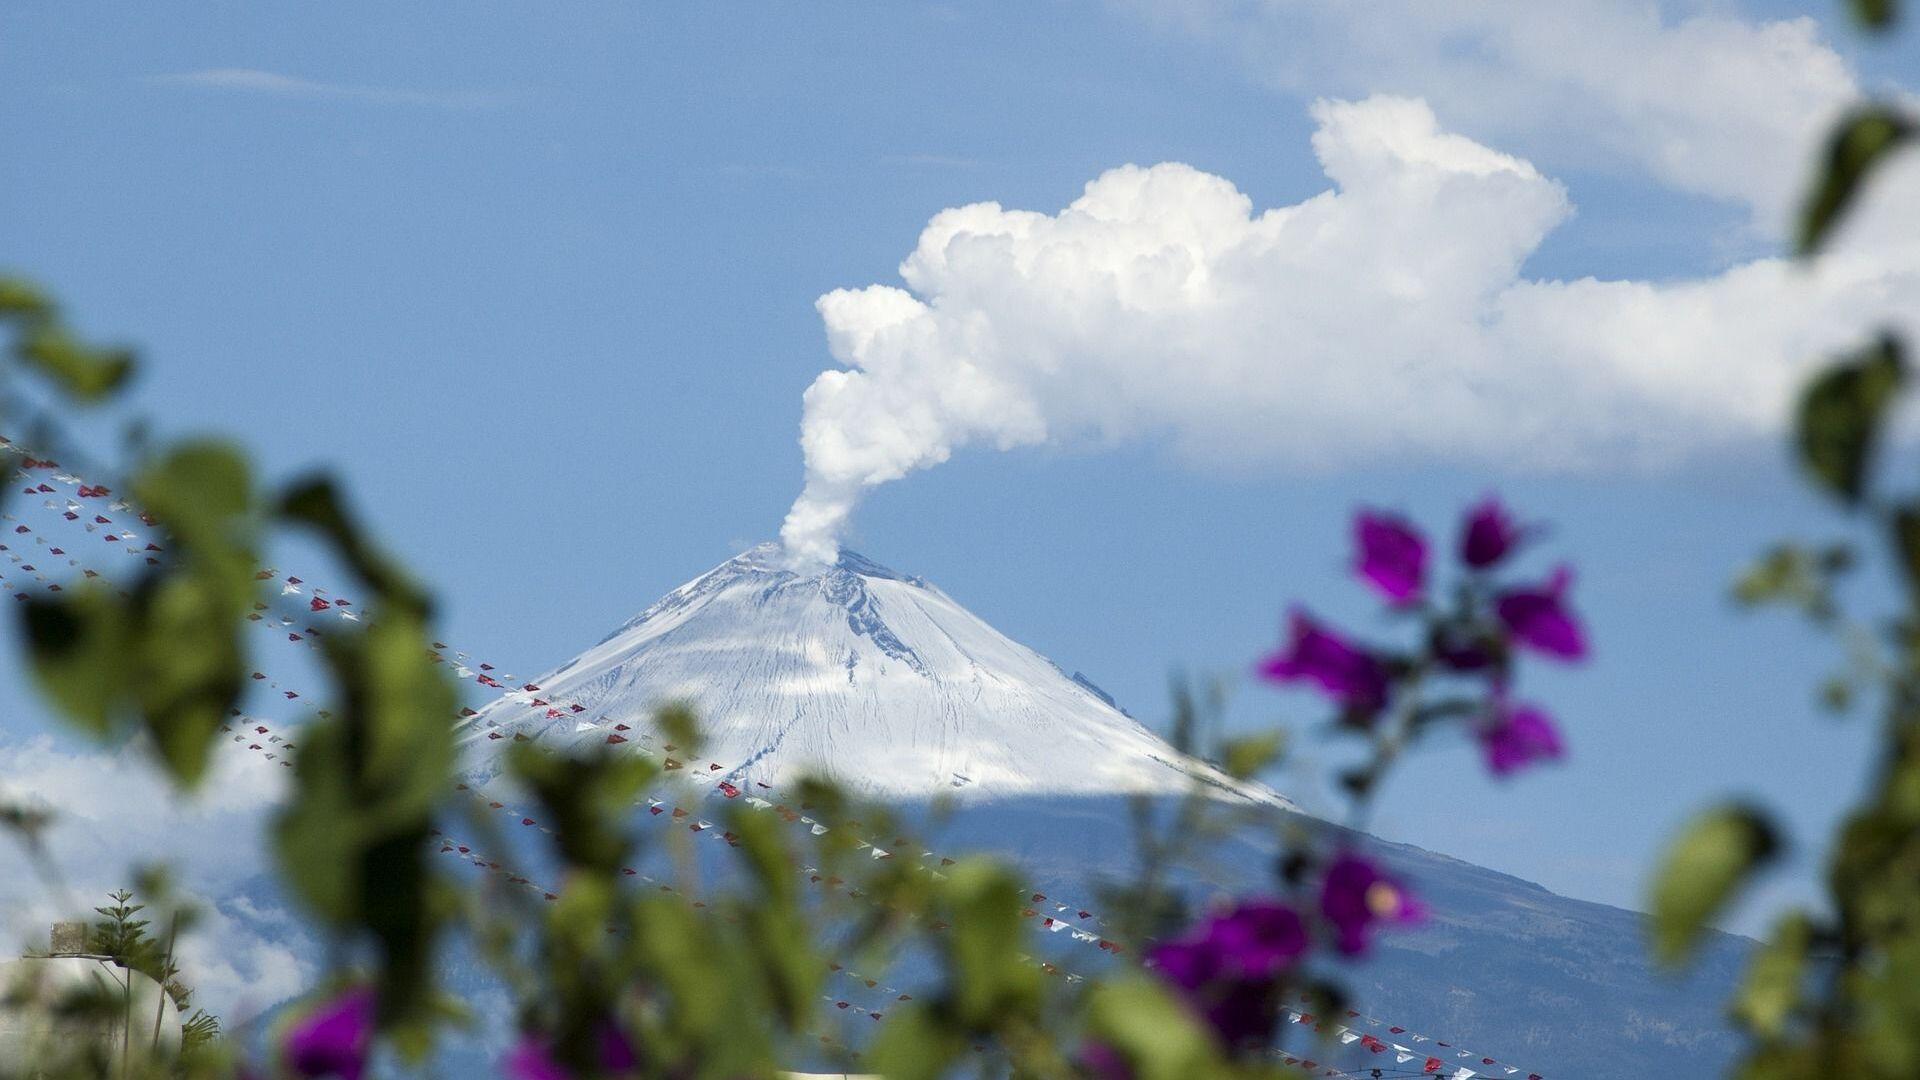 El volcán Popocatépetl, foto de archivo - Sputnik Mundo, 1920, 15.09.2021